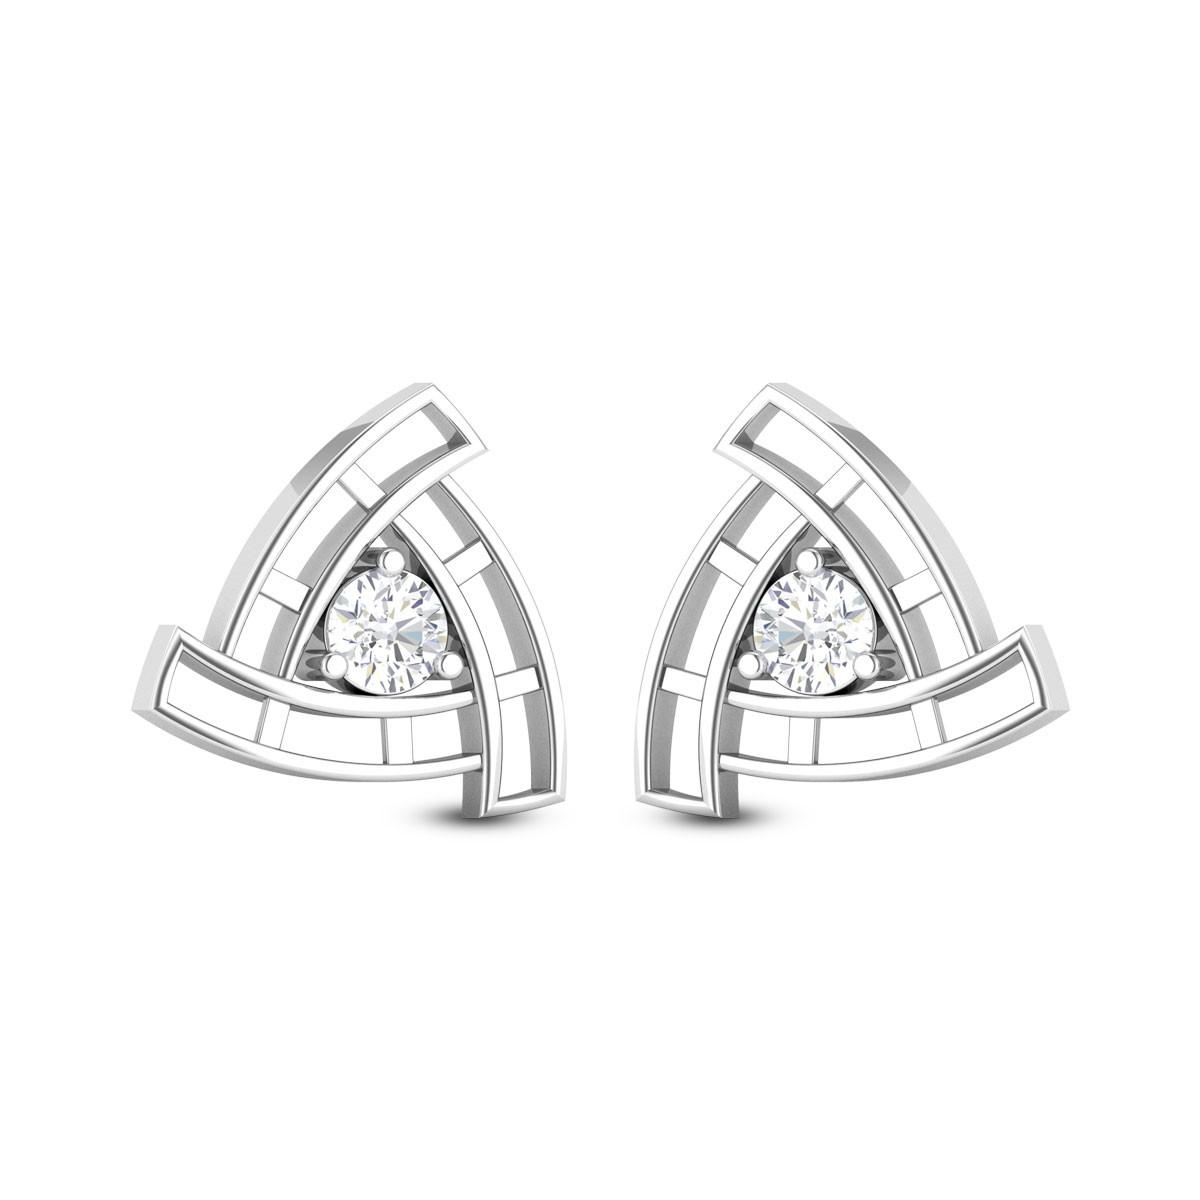 Aamodh Triangular Solitaire Stud Earrings